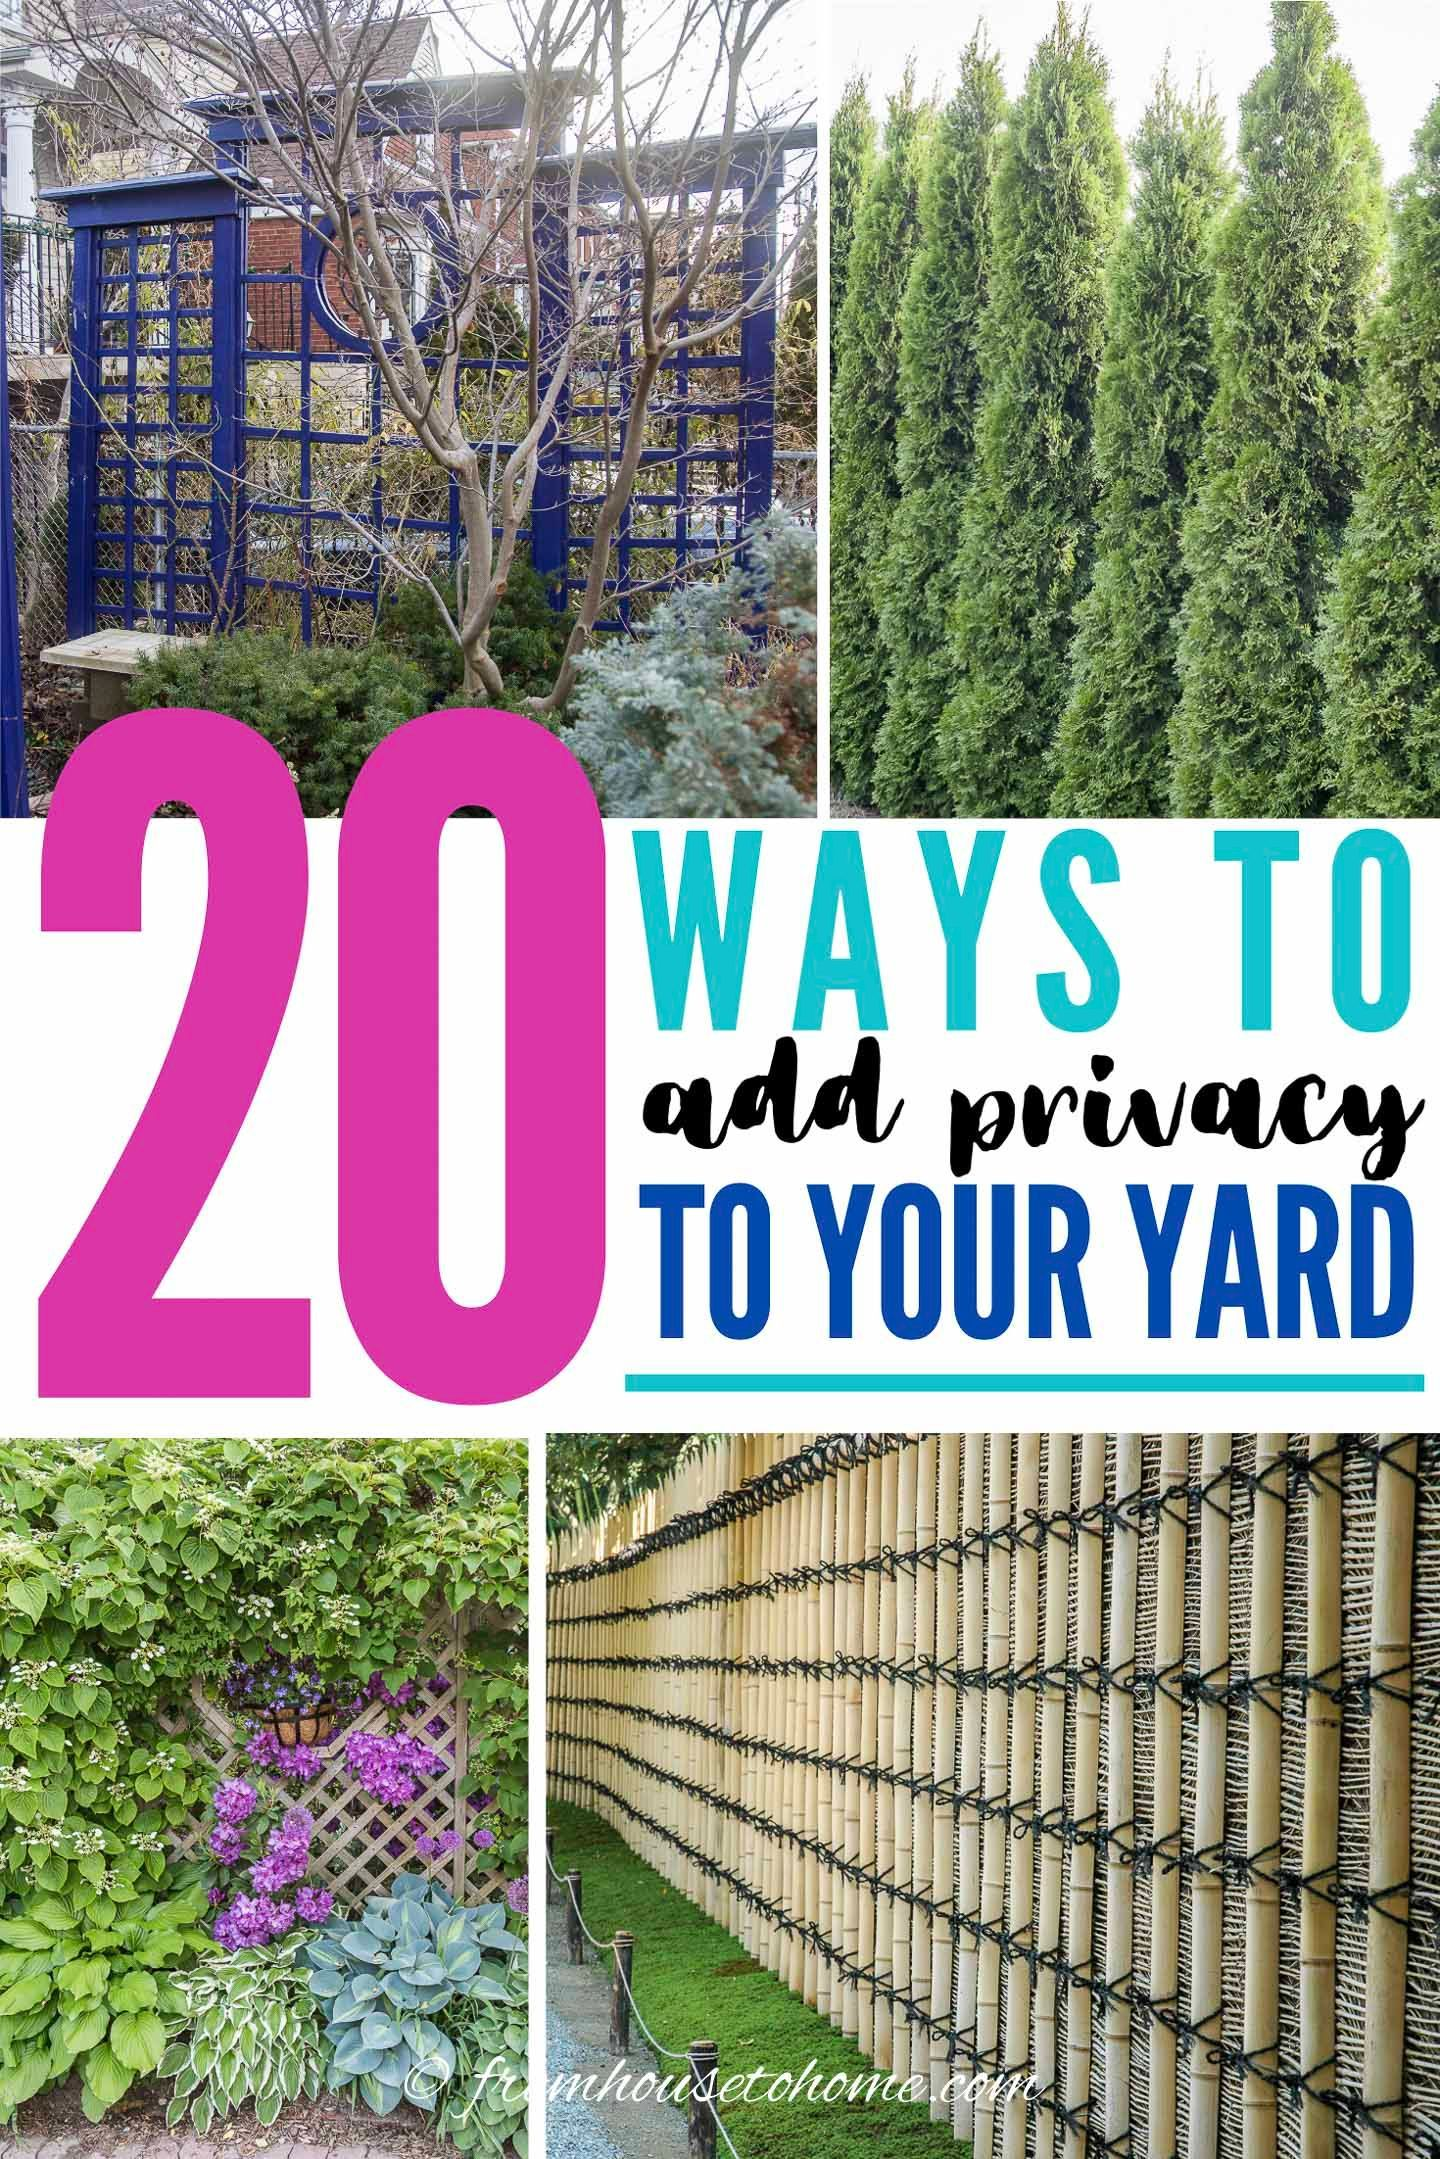 20 Backyard Privacy Ideas For Screening Neighbors Out In 2020 Backyard Privacy Backyard Garden Privacy